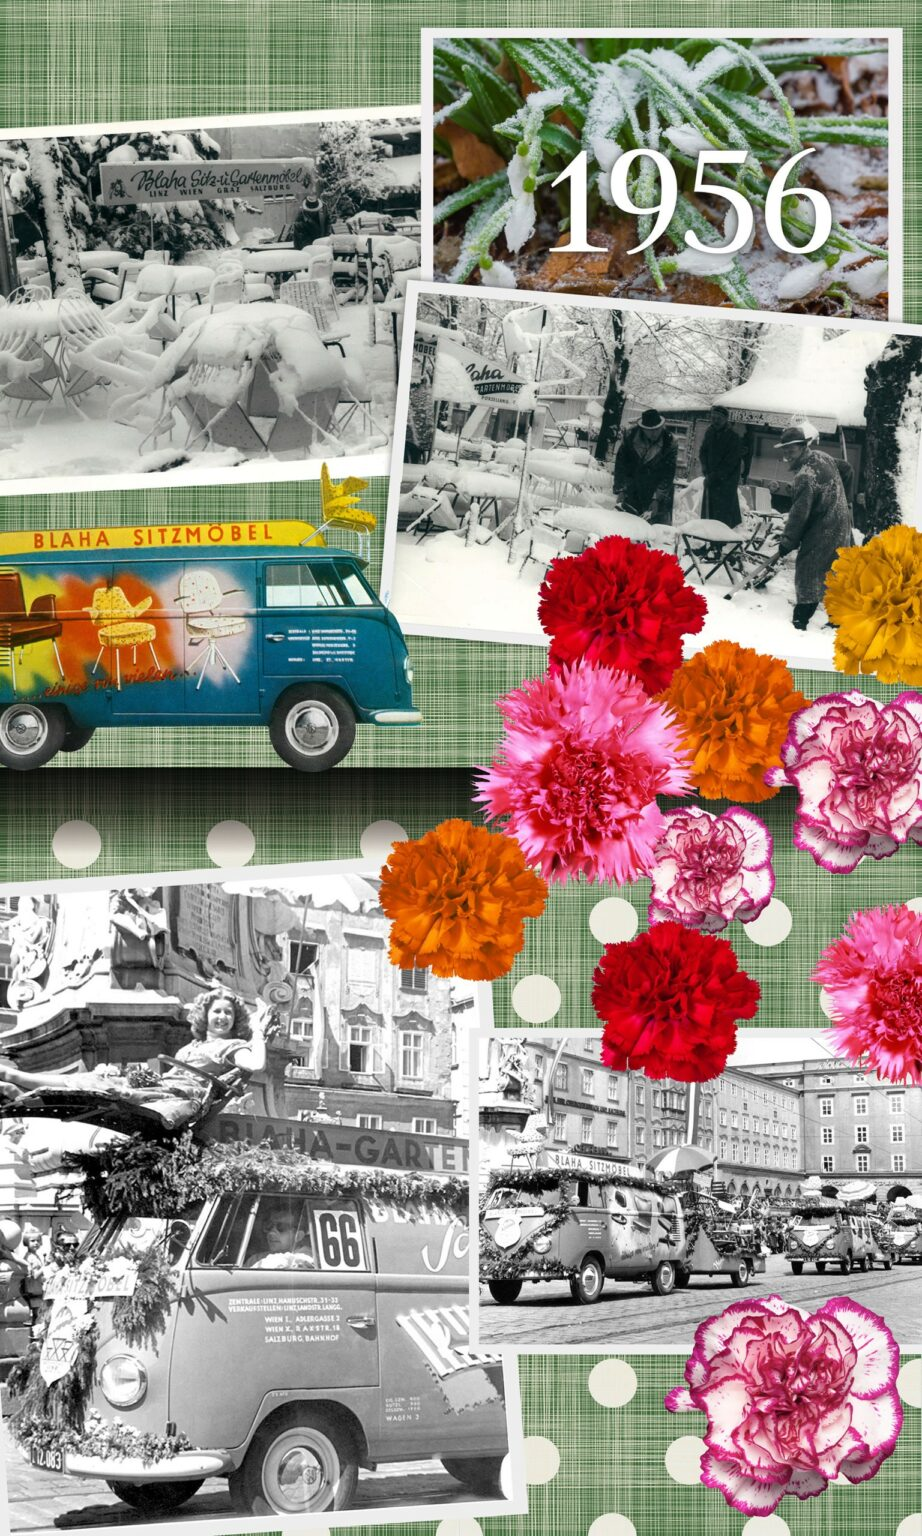 mobile 1956